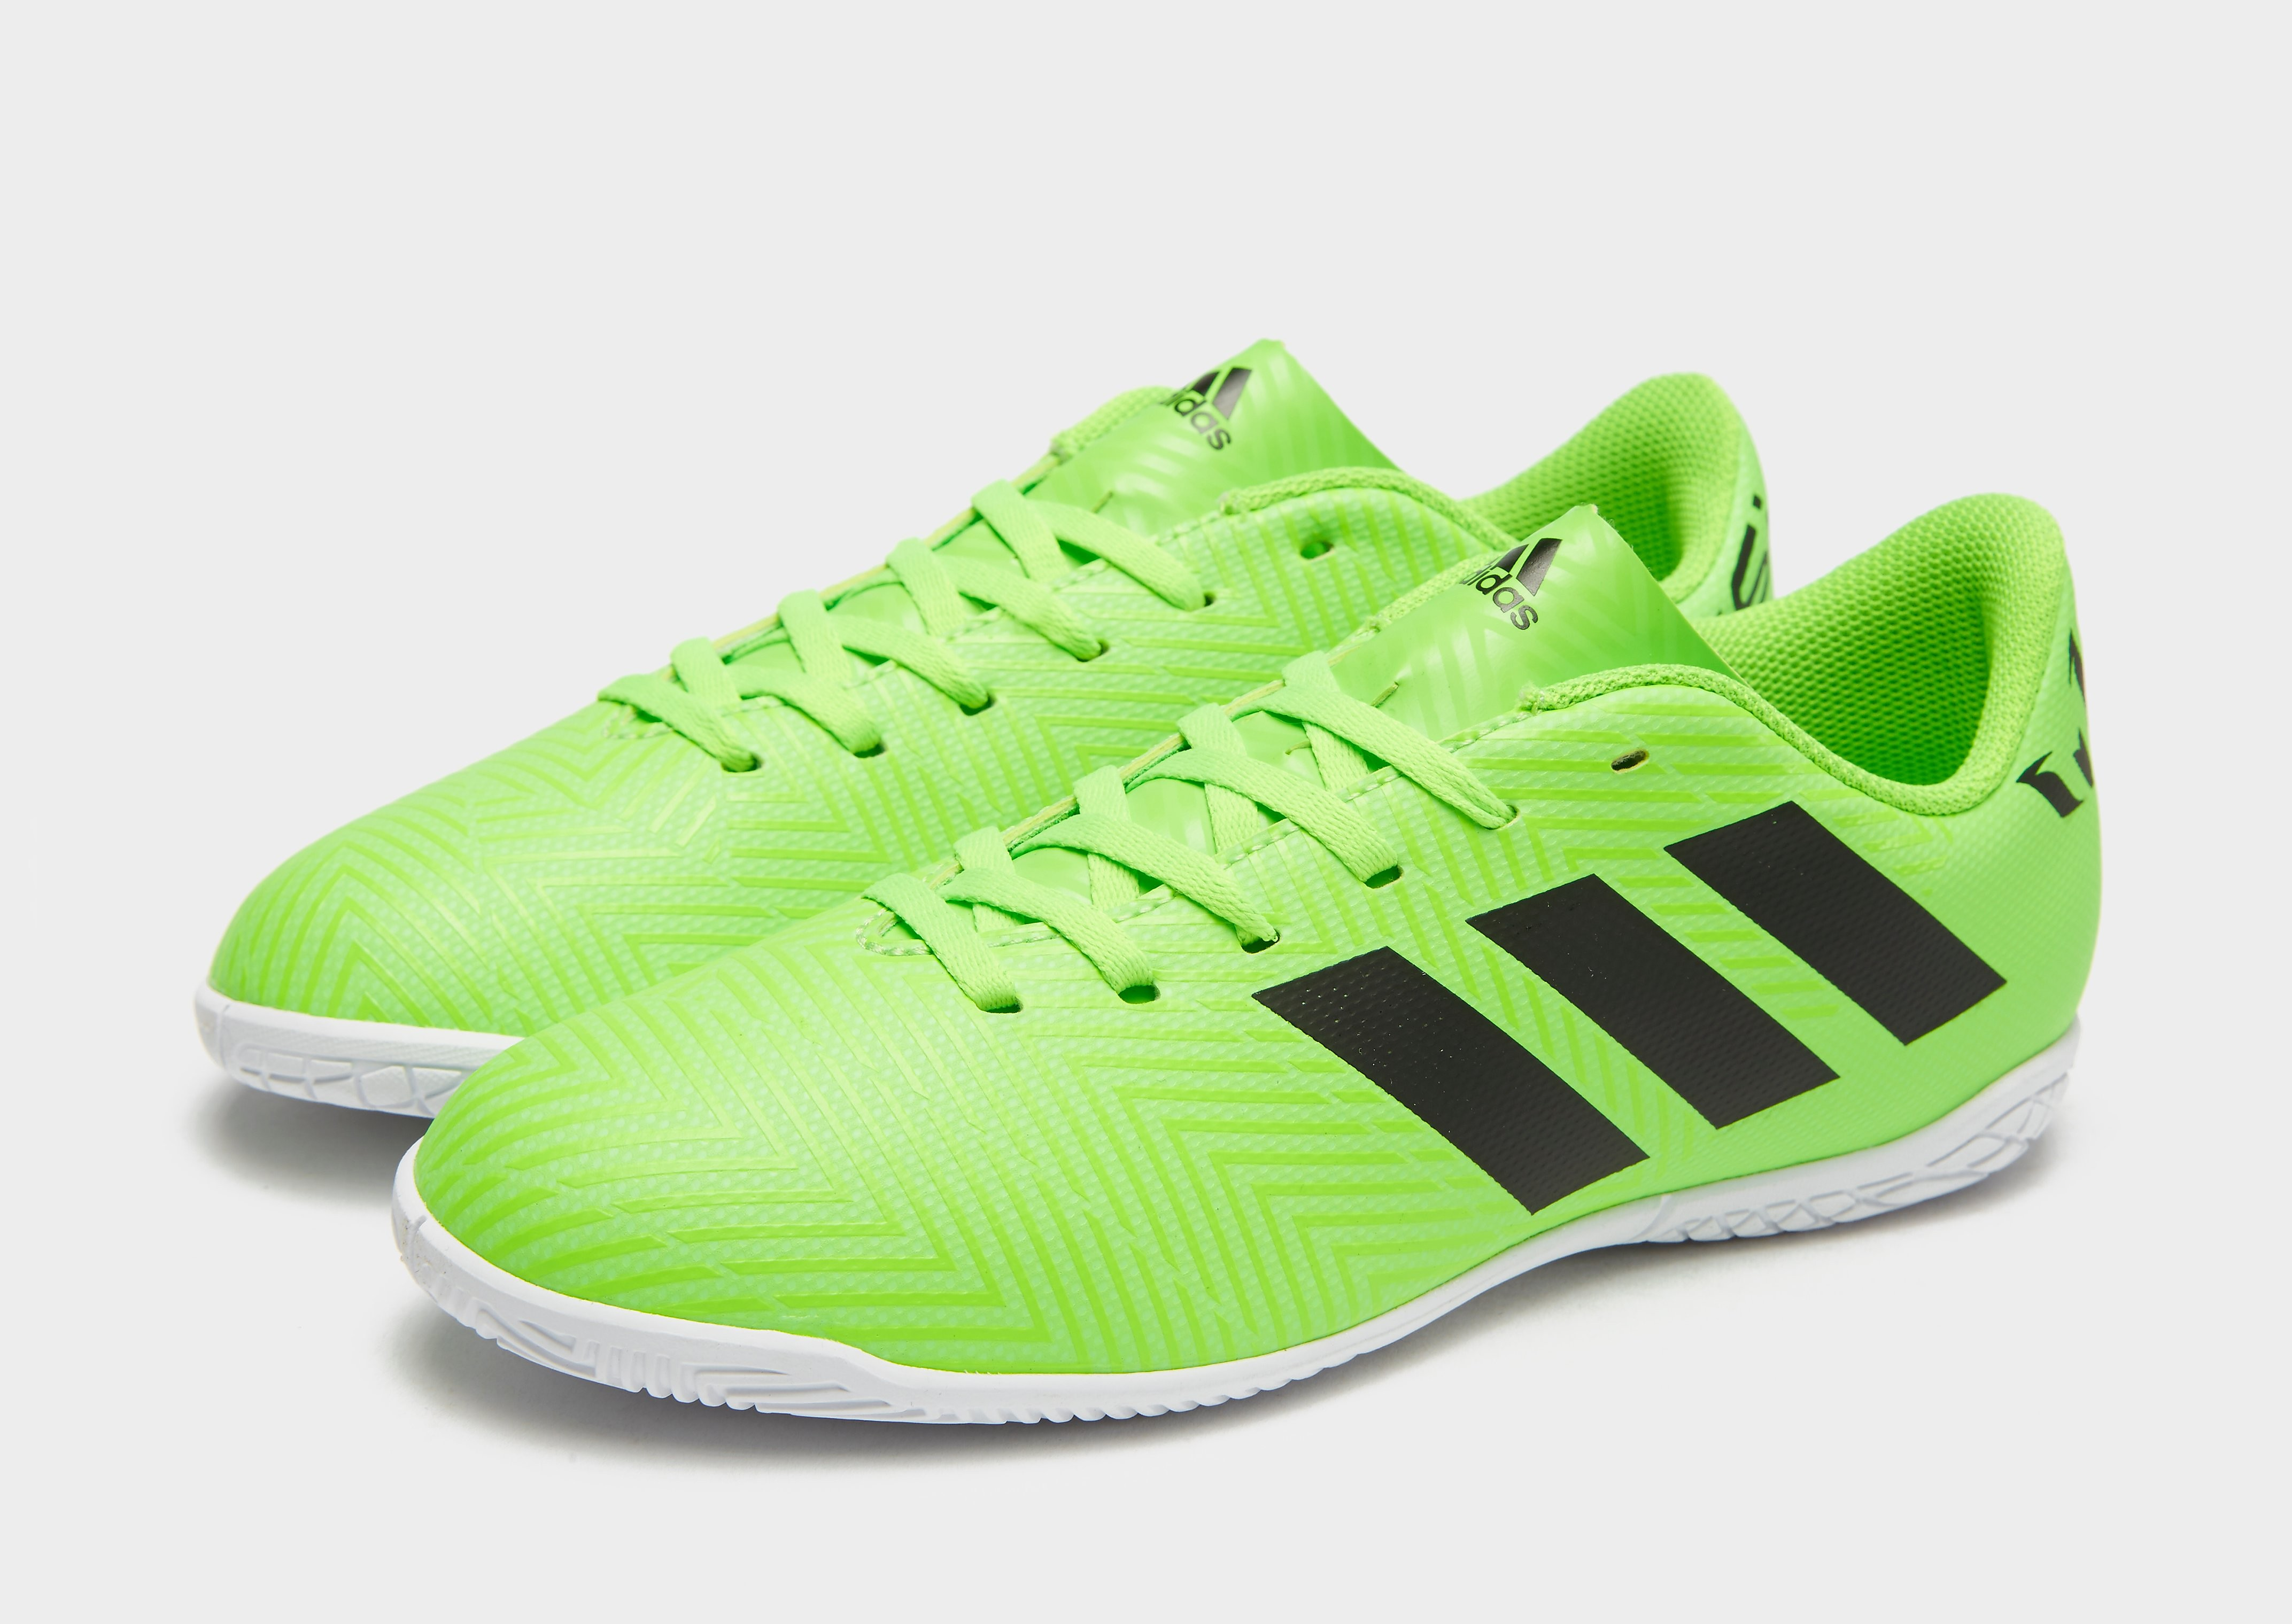 Adidas botas de fútbol JD Sports